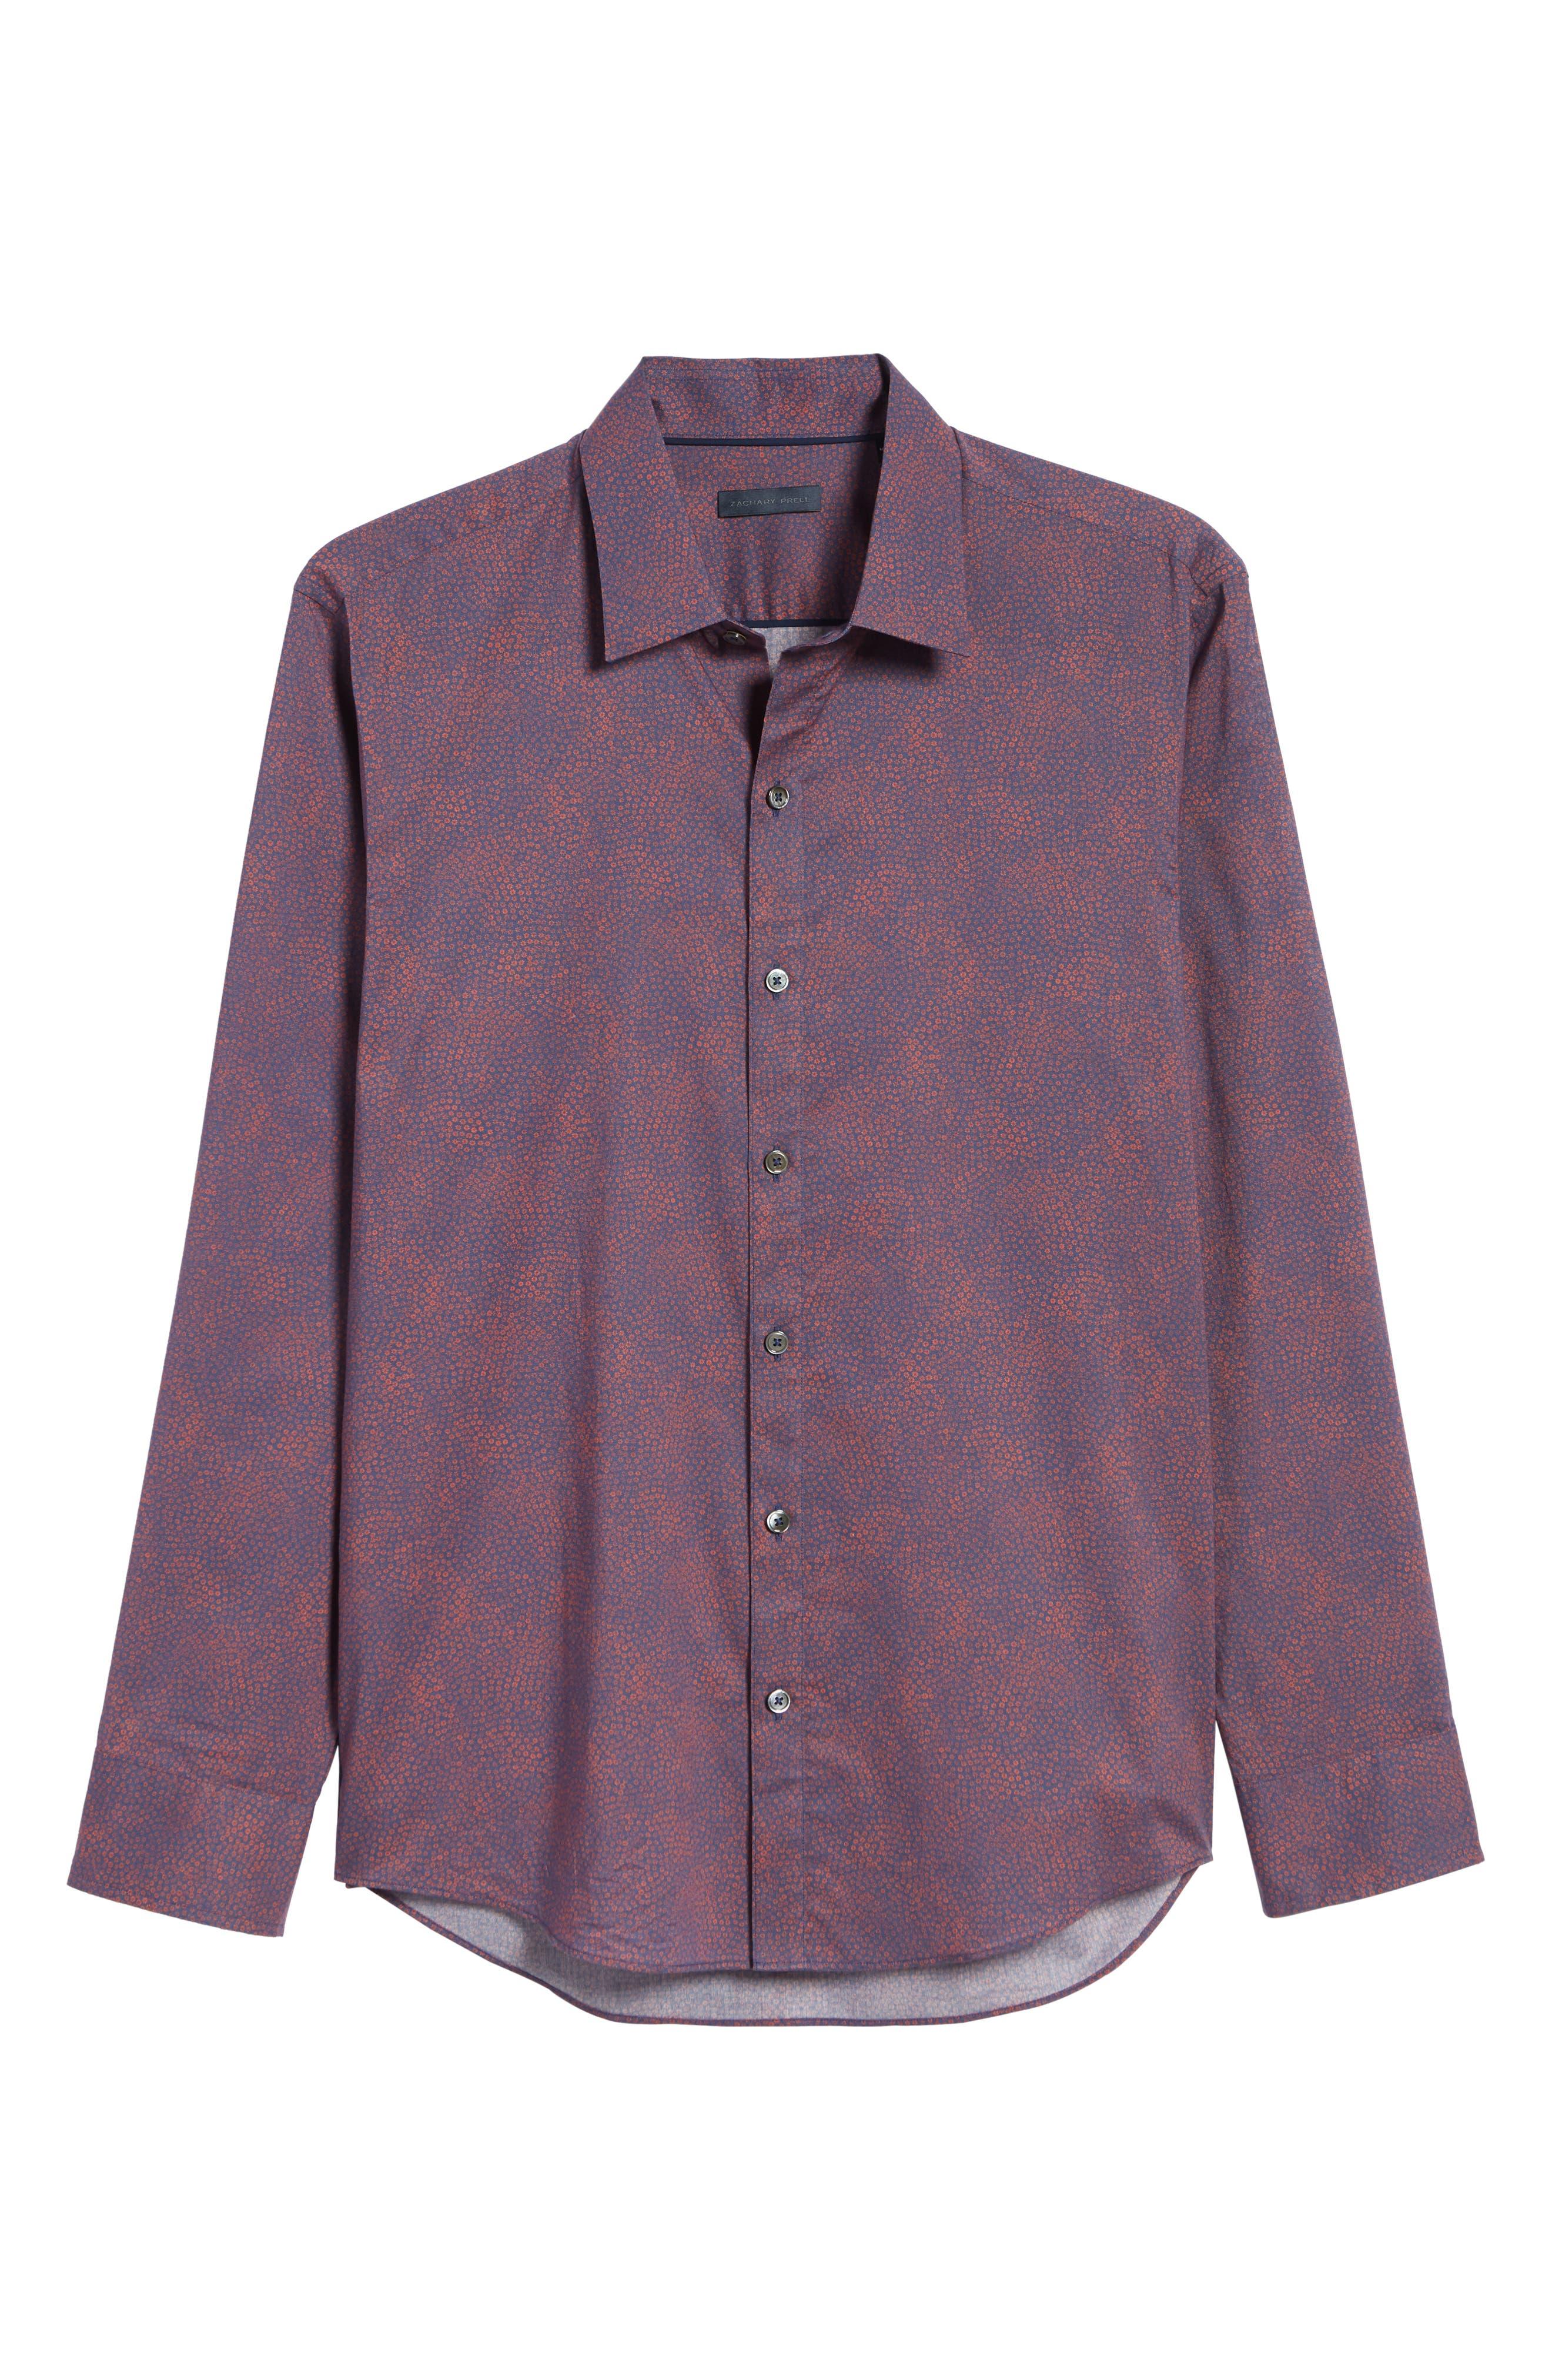 ZACHARY PRELL, Maryna Regular Fit Floral Print Sport Shirt, Alternate thumbnail 5, color, ORANGE